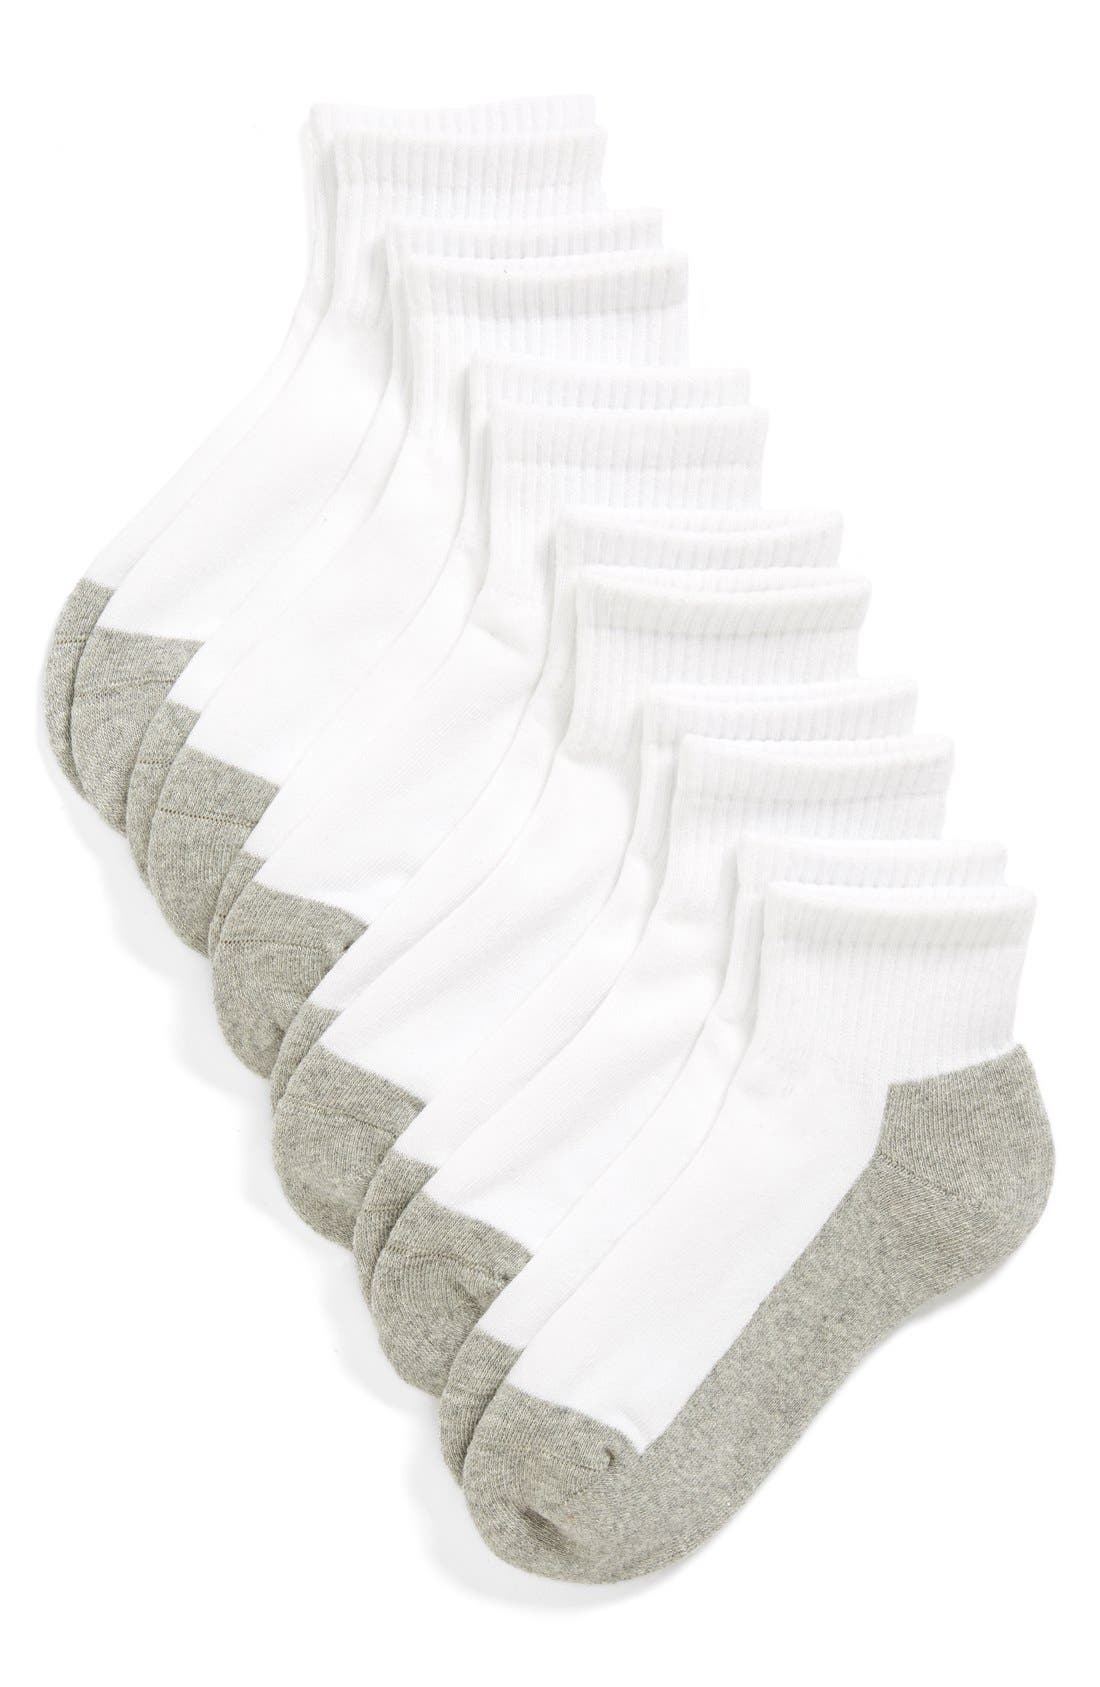 TUCKER + TATE 6-Pack Active Quarter Socks, Main, color, WHITE/ GREY